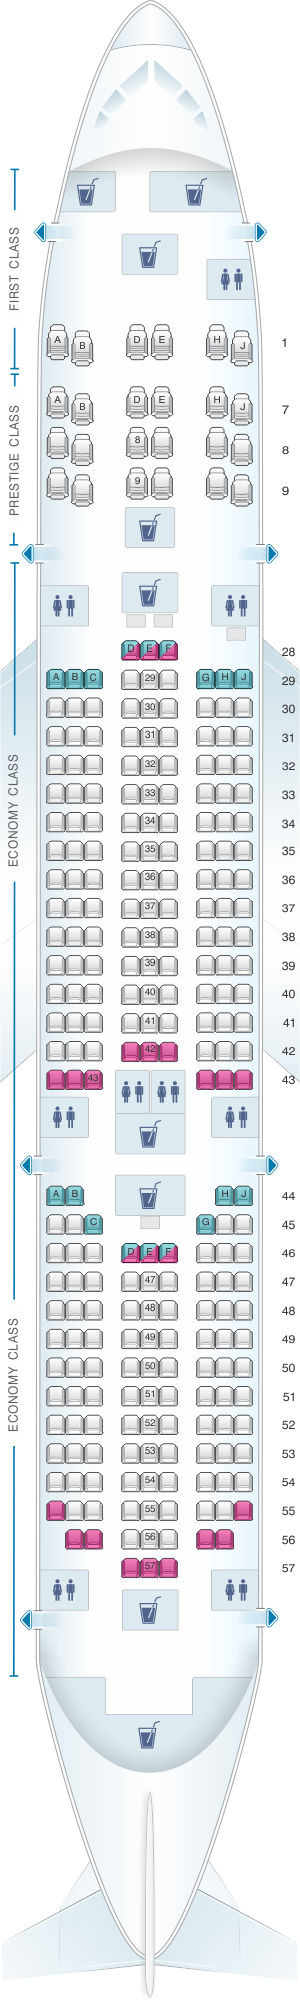 Seat map for Korean Air Boeing B787 9